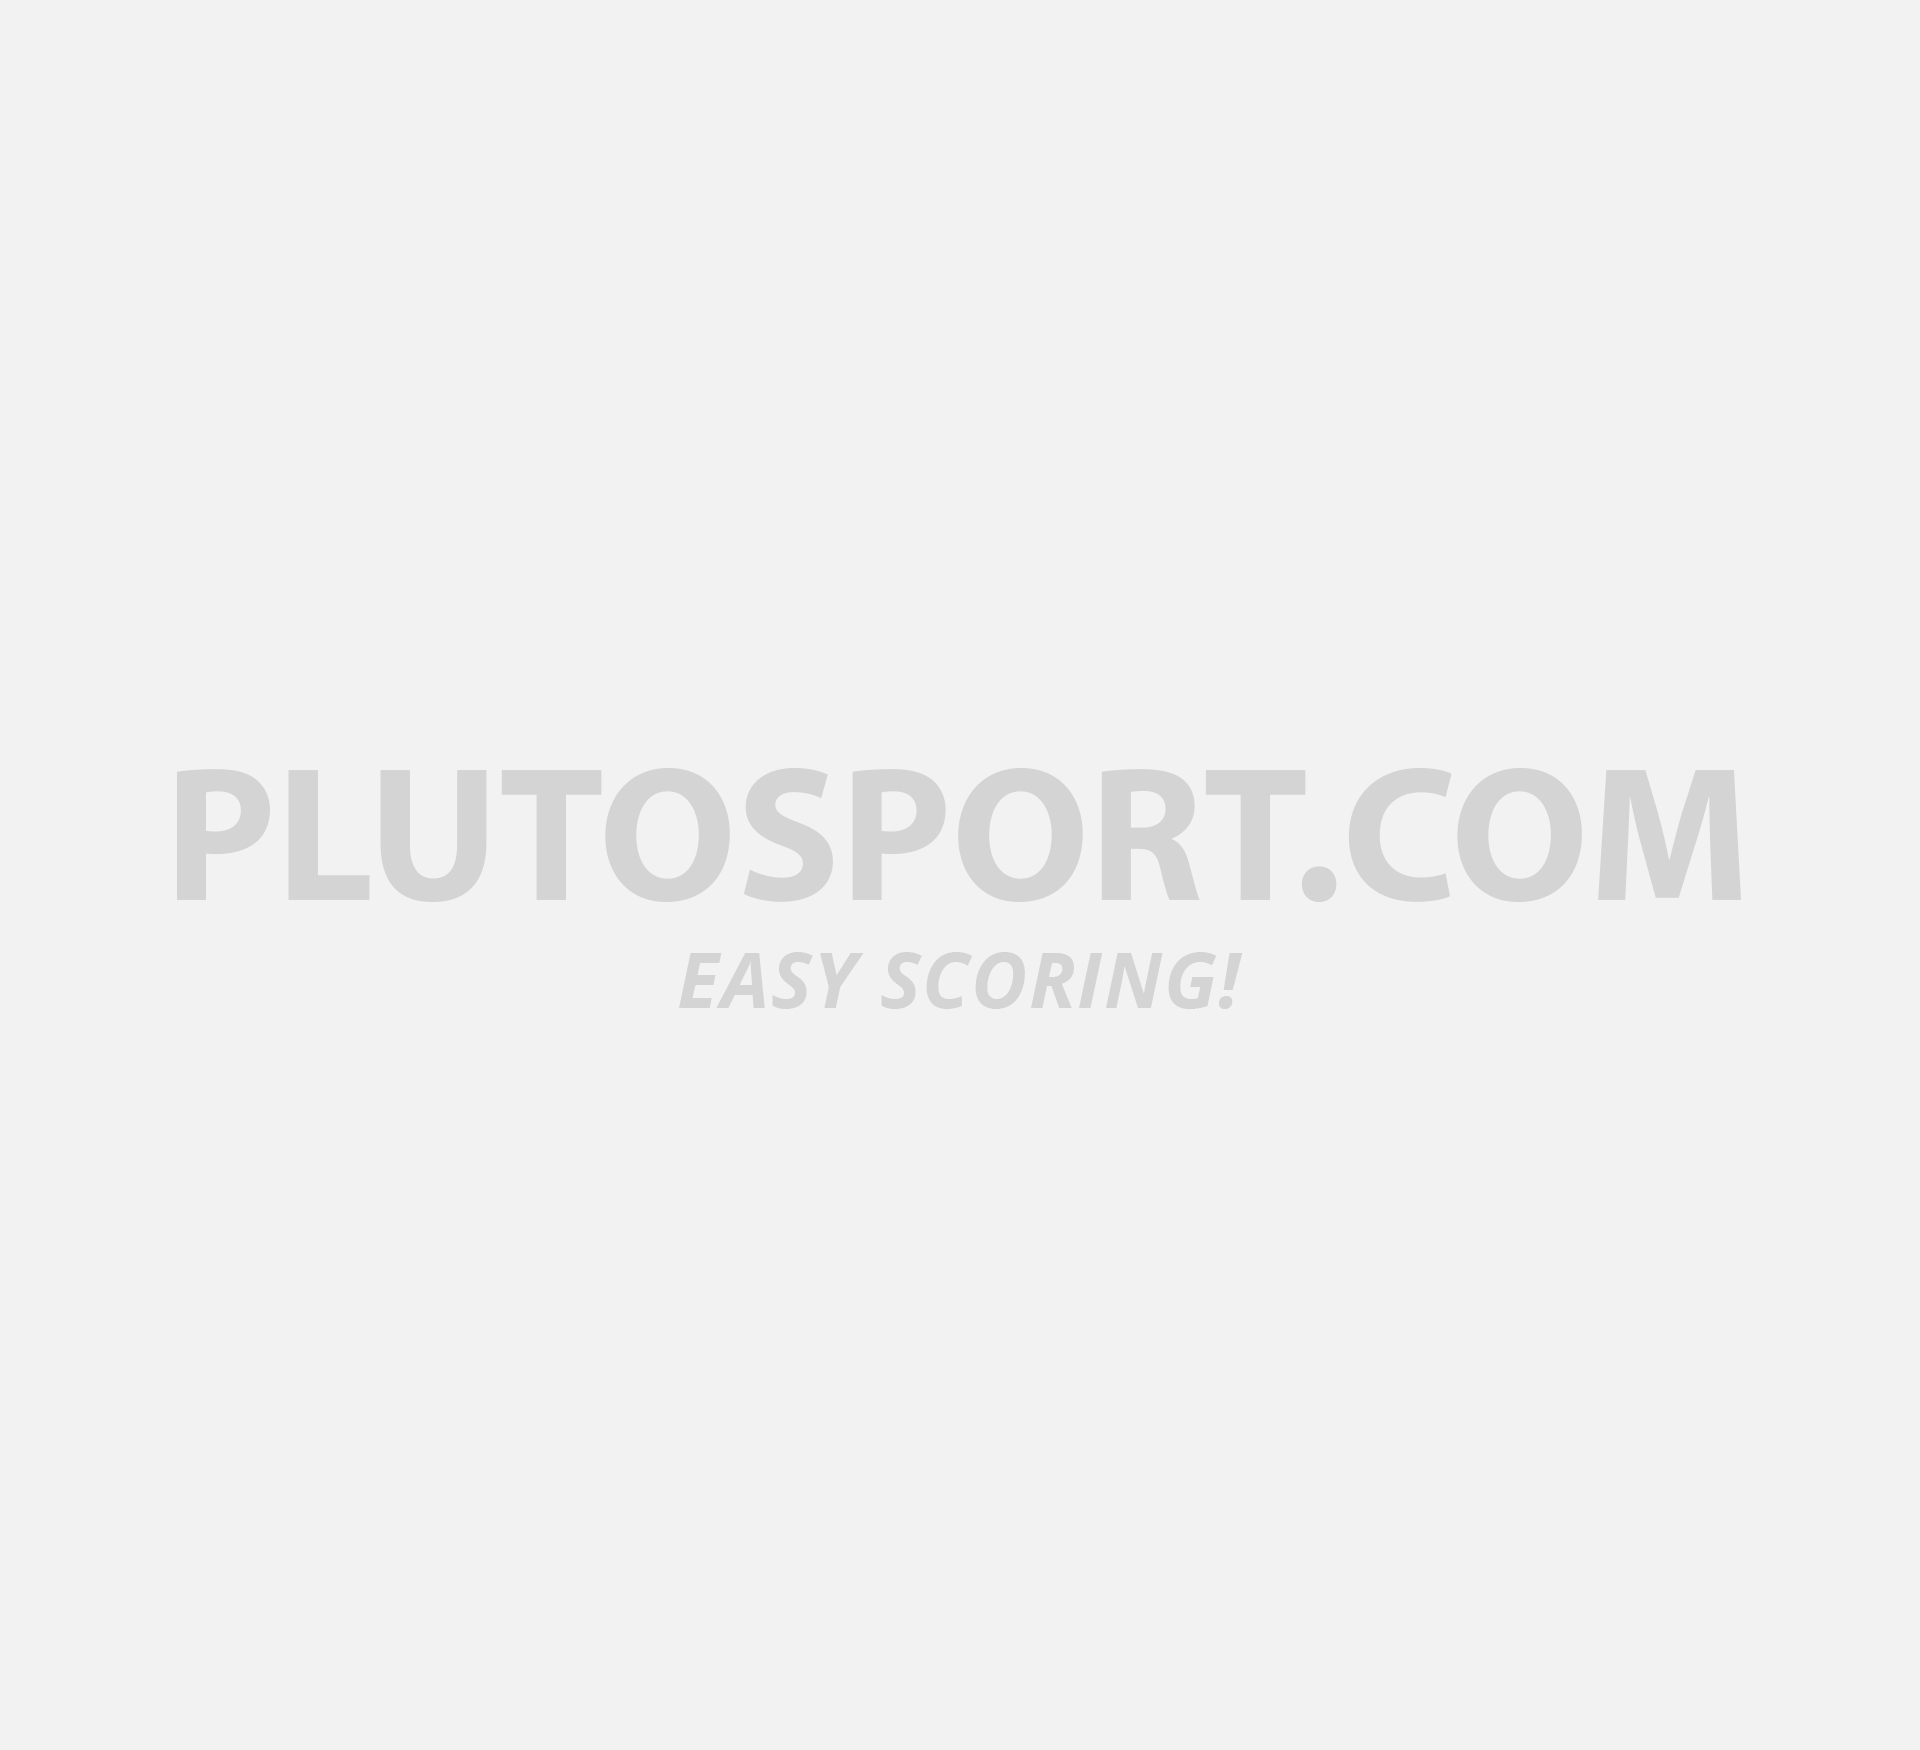 hot sale online d0cf7 aab17 Nike Phantom Vision Elite Dynamic Fit FG - Boots fixed stud - Shoes -  Football - Sports | Plutosport